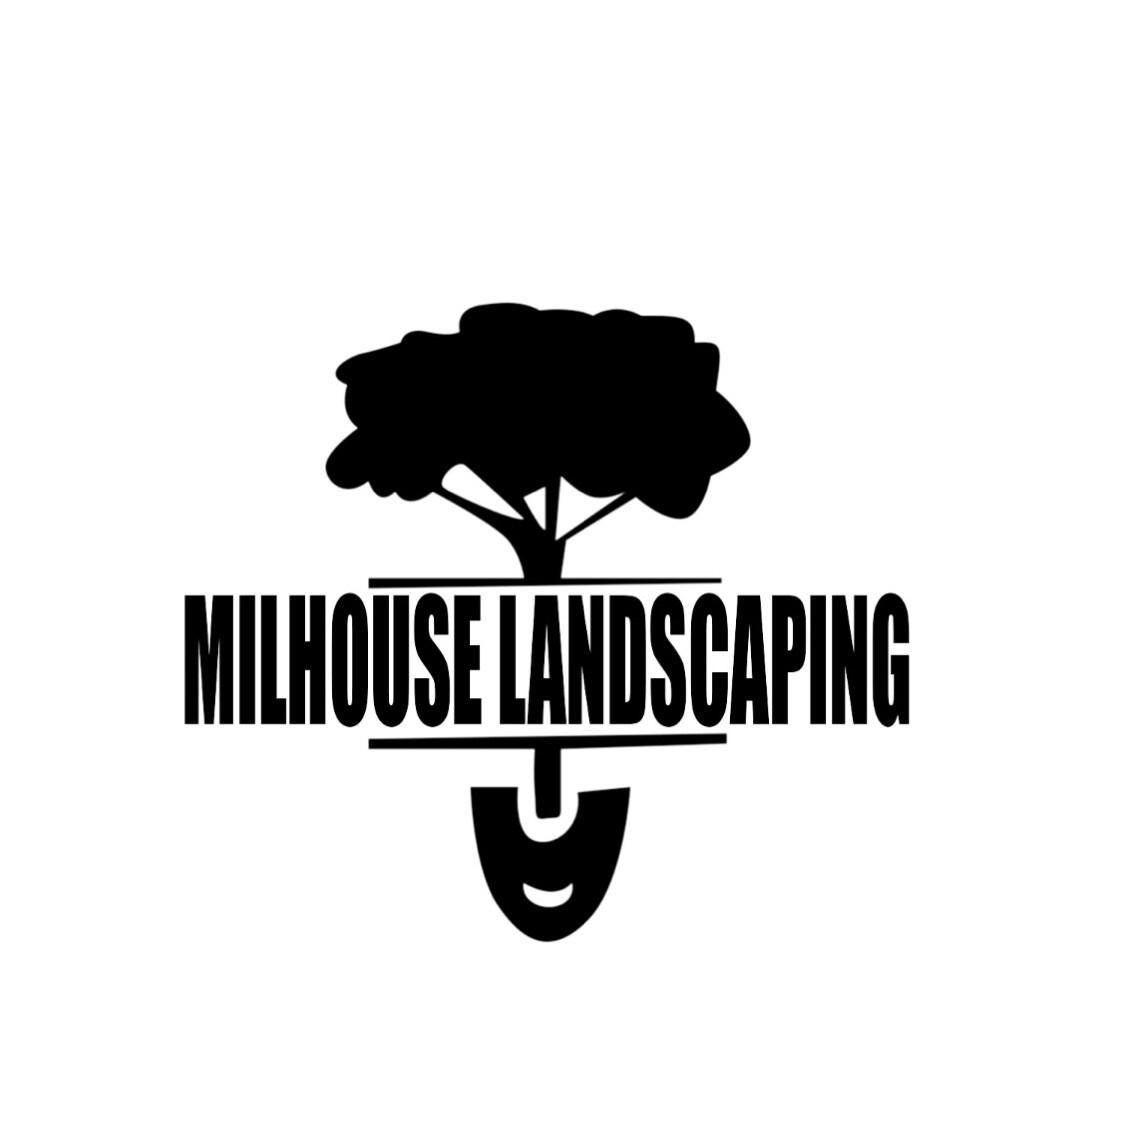 Milhouse Landscaping